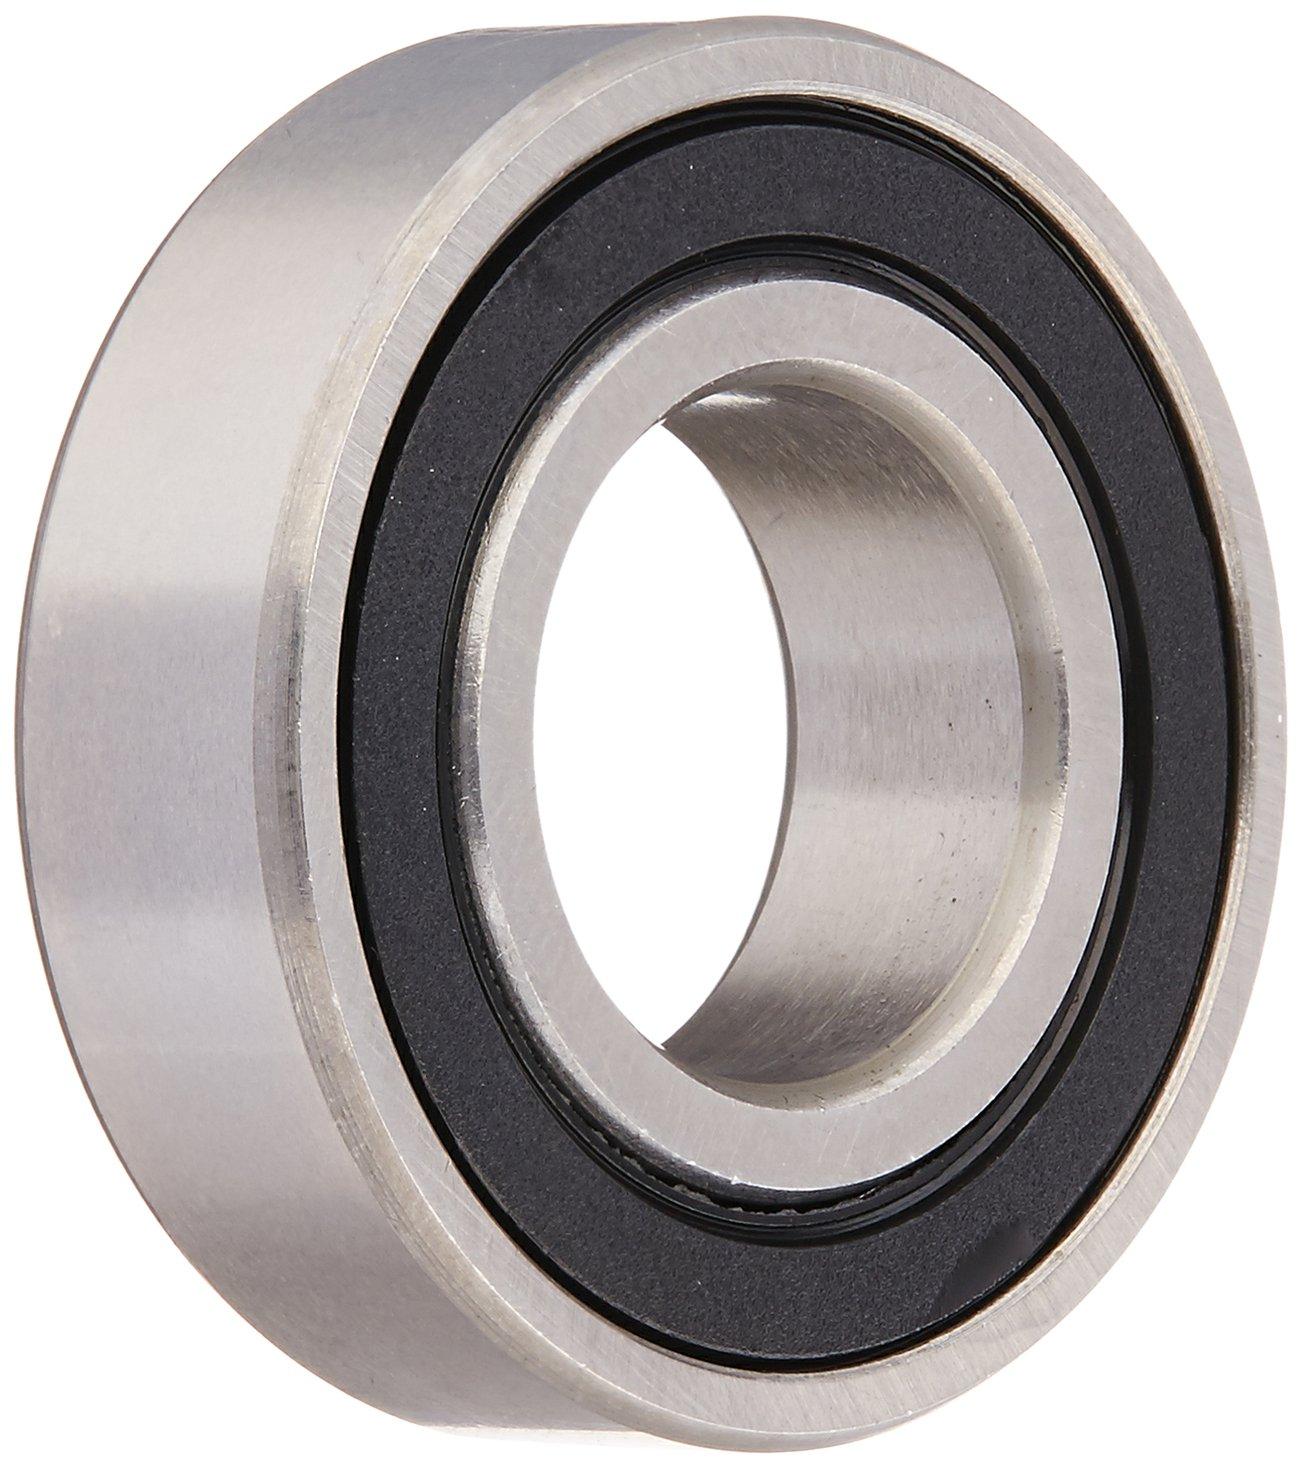 16x31x10 mm 1 PCS 163110-2RS Rubber Sealed Ball Bearing Bearings BLACK